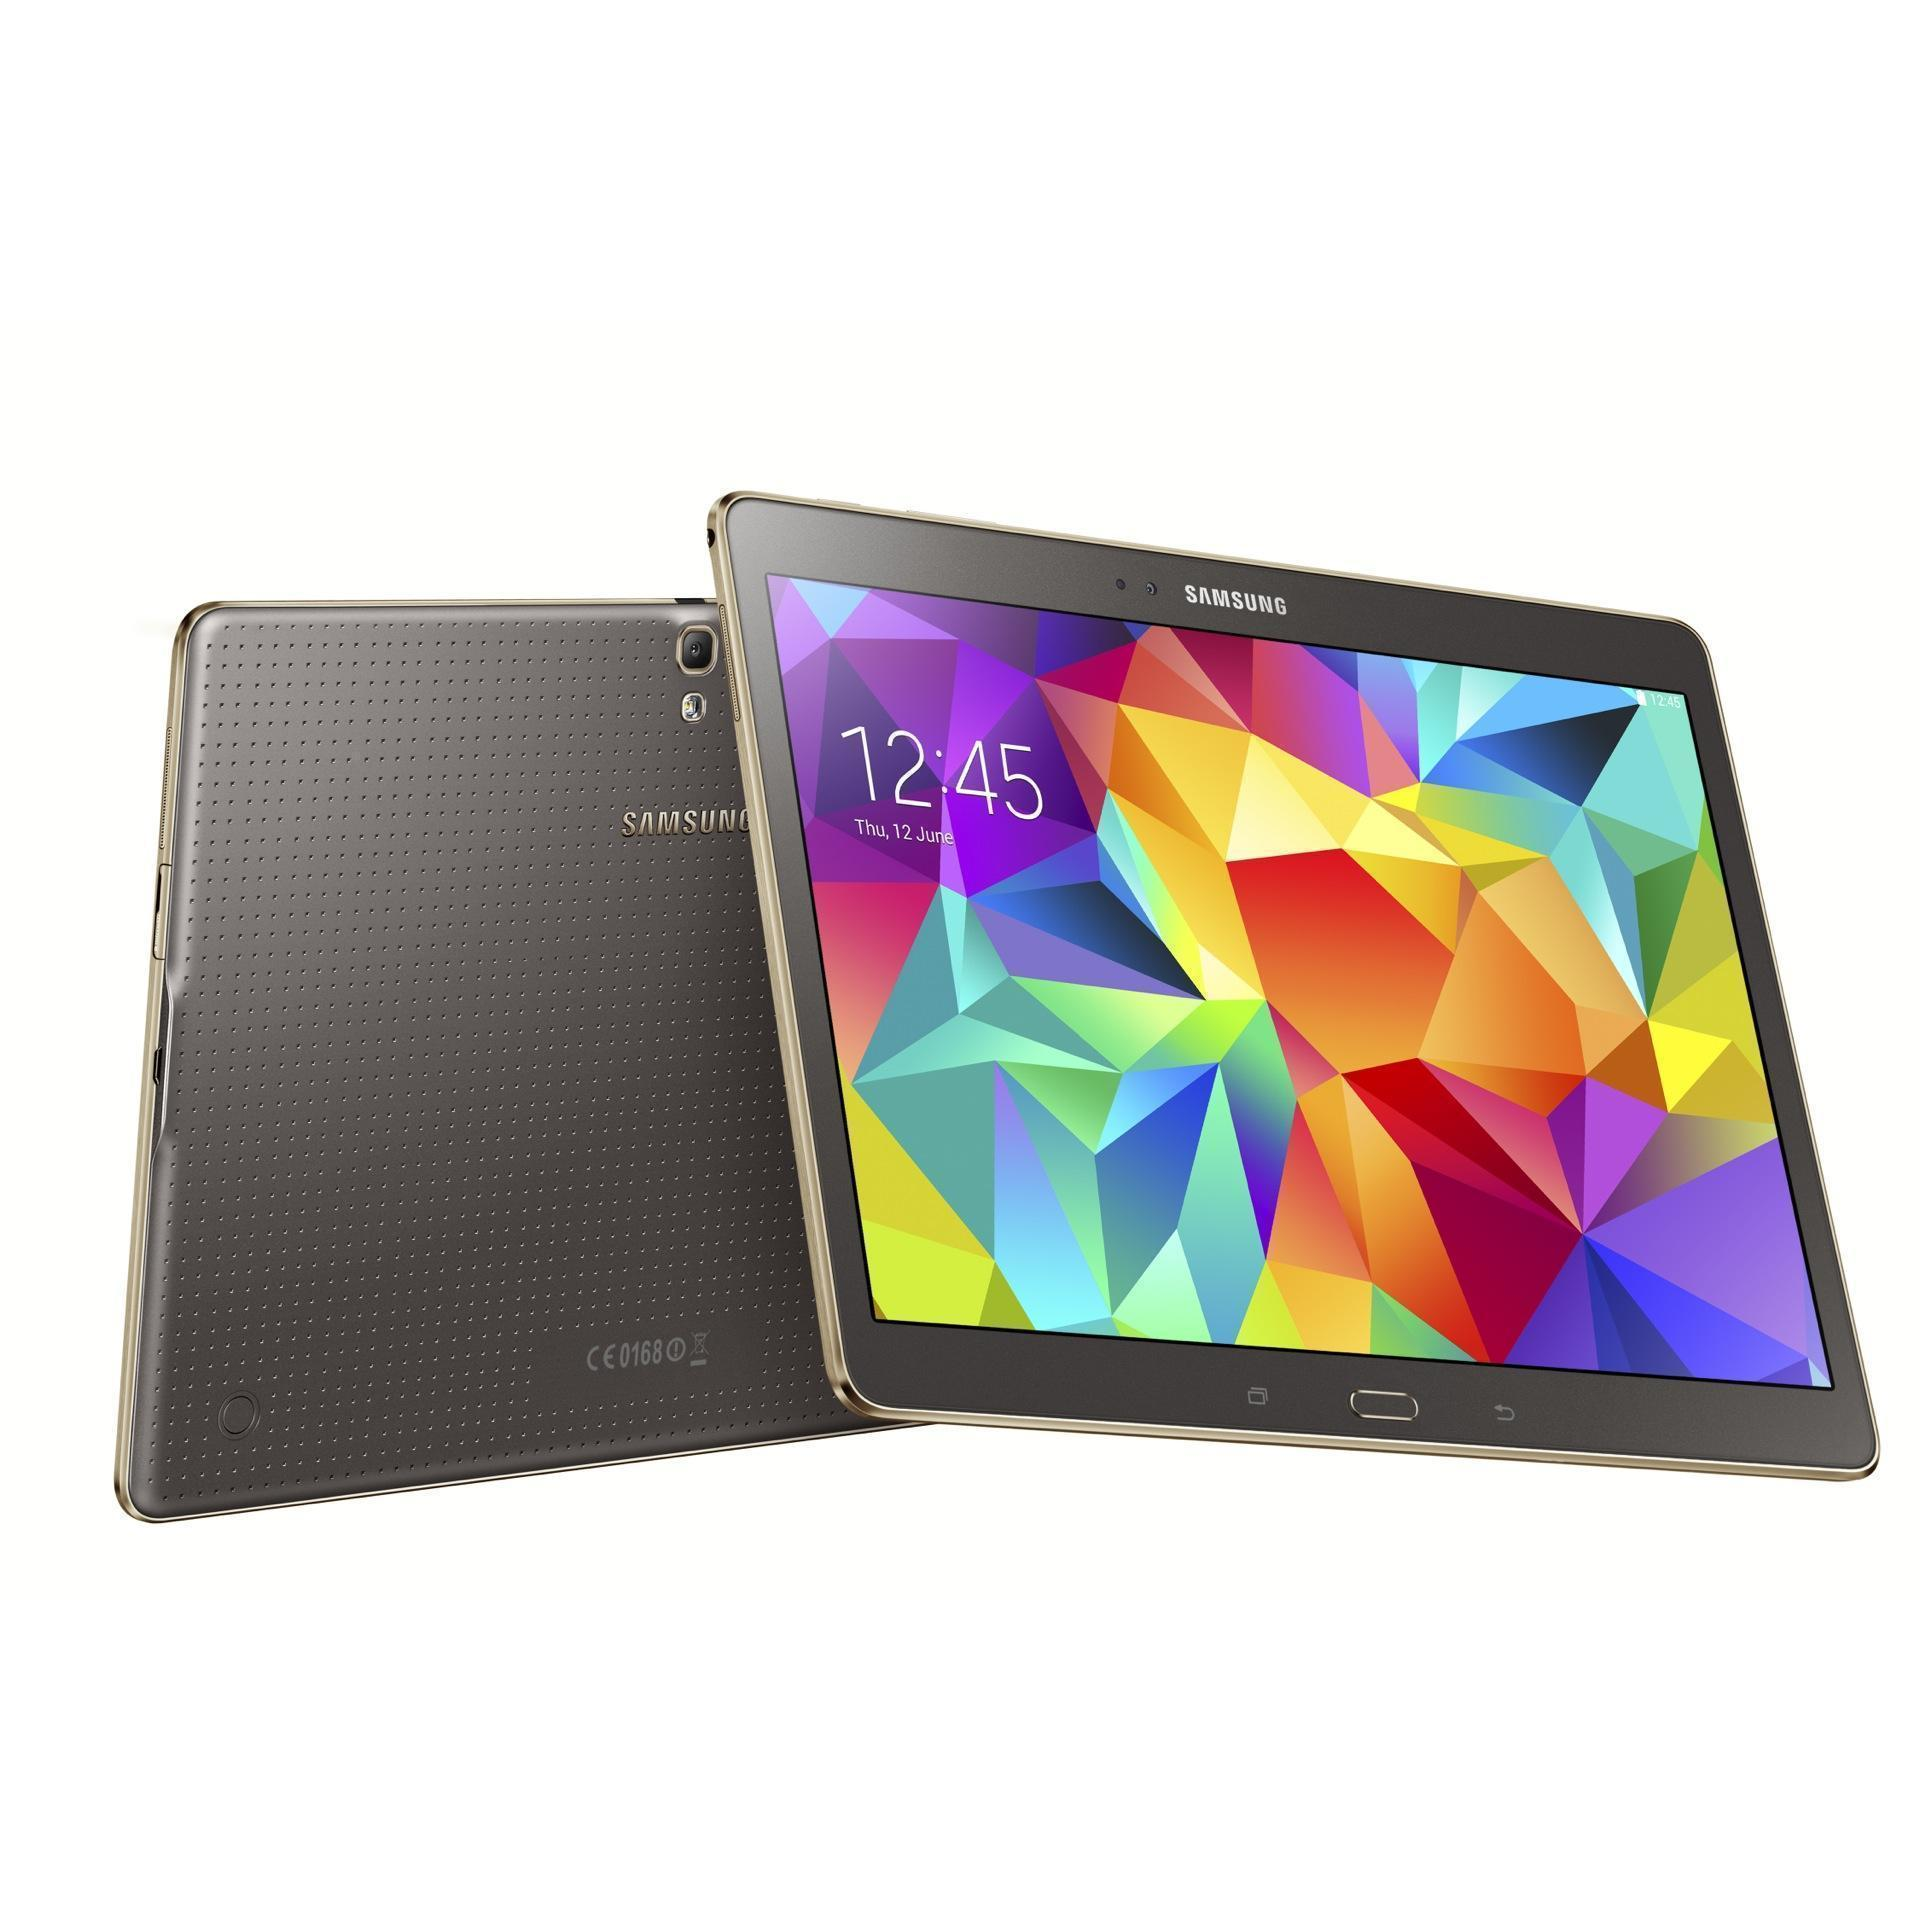 "Samsung Tab S SM-T705 - 8,4"" 16 Gb - 4G (LTE) - Bronce"